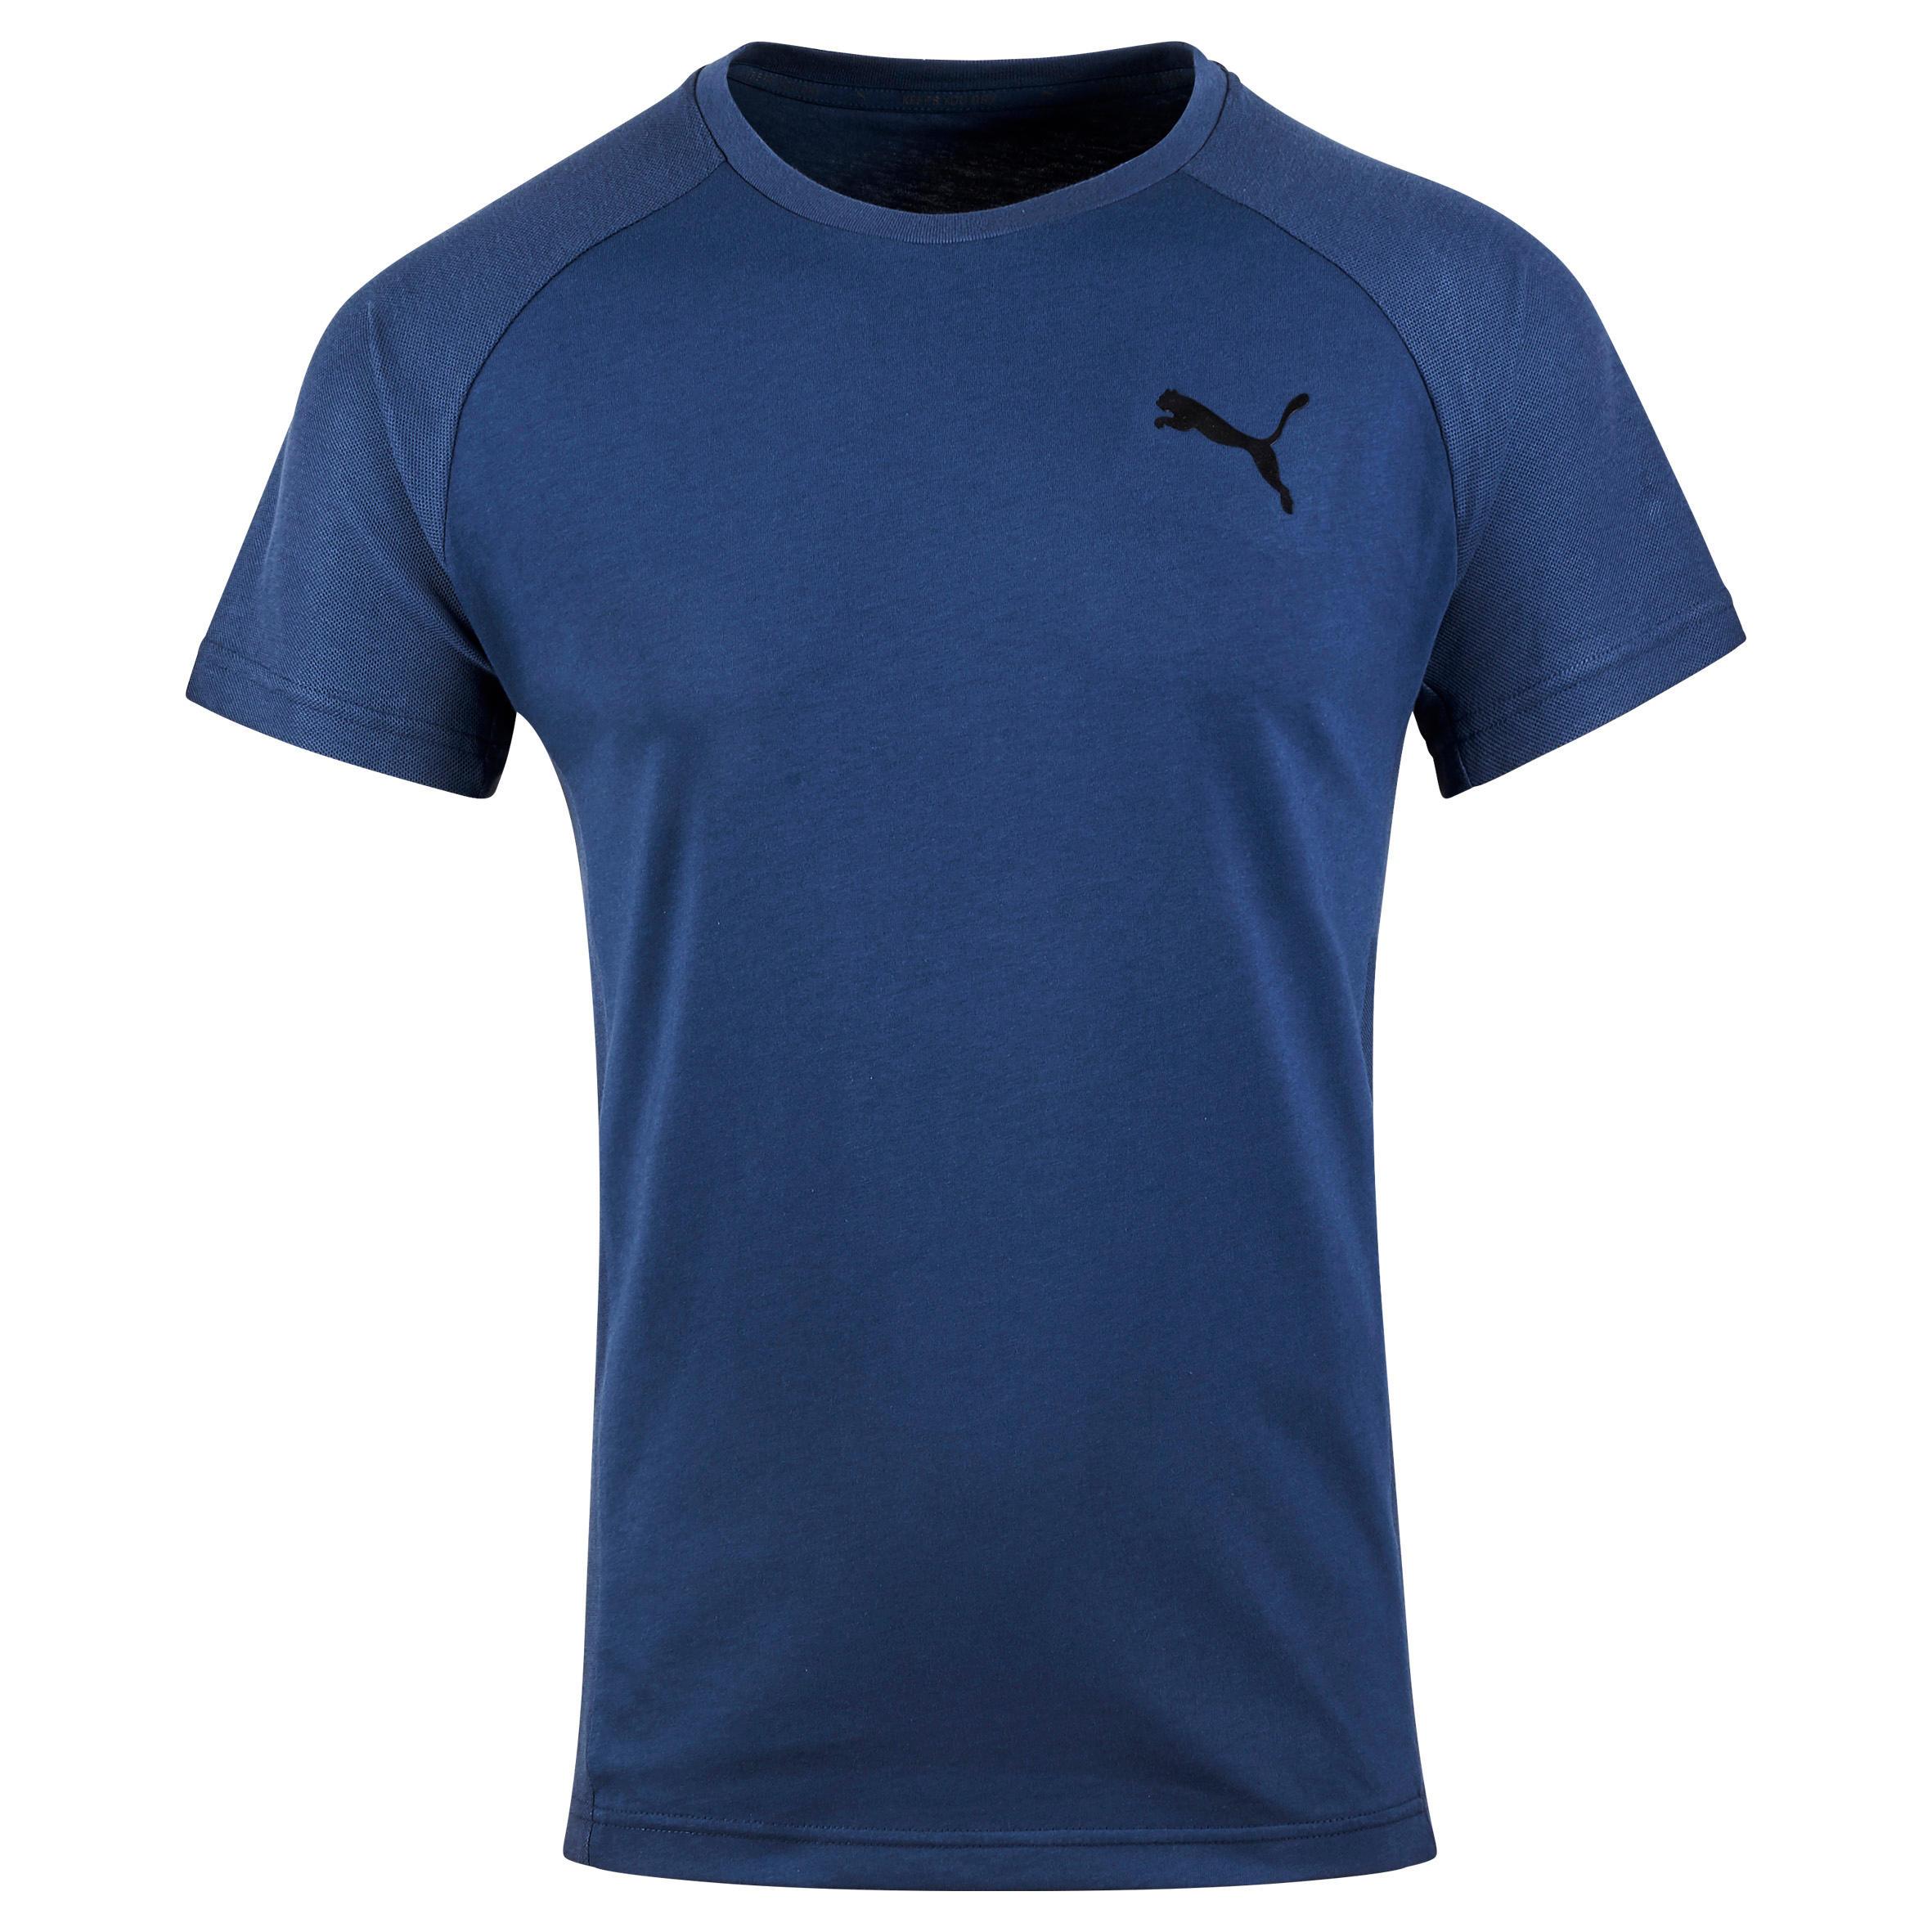 Puma Heren T-shirt Puma voor gym en pilates Evostripe blauw